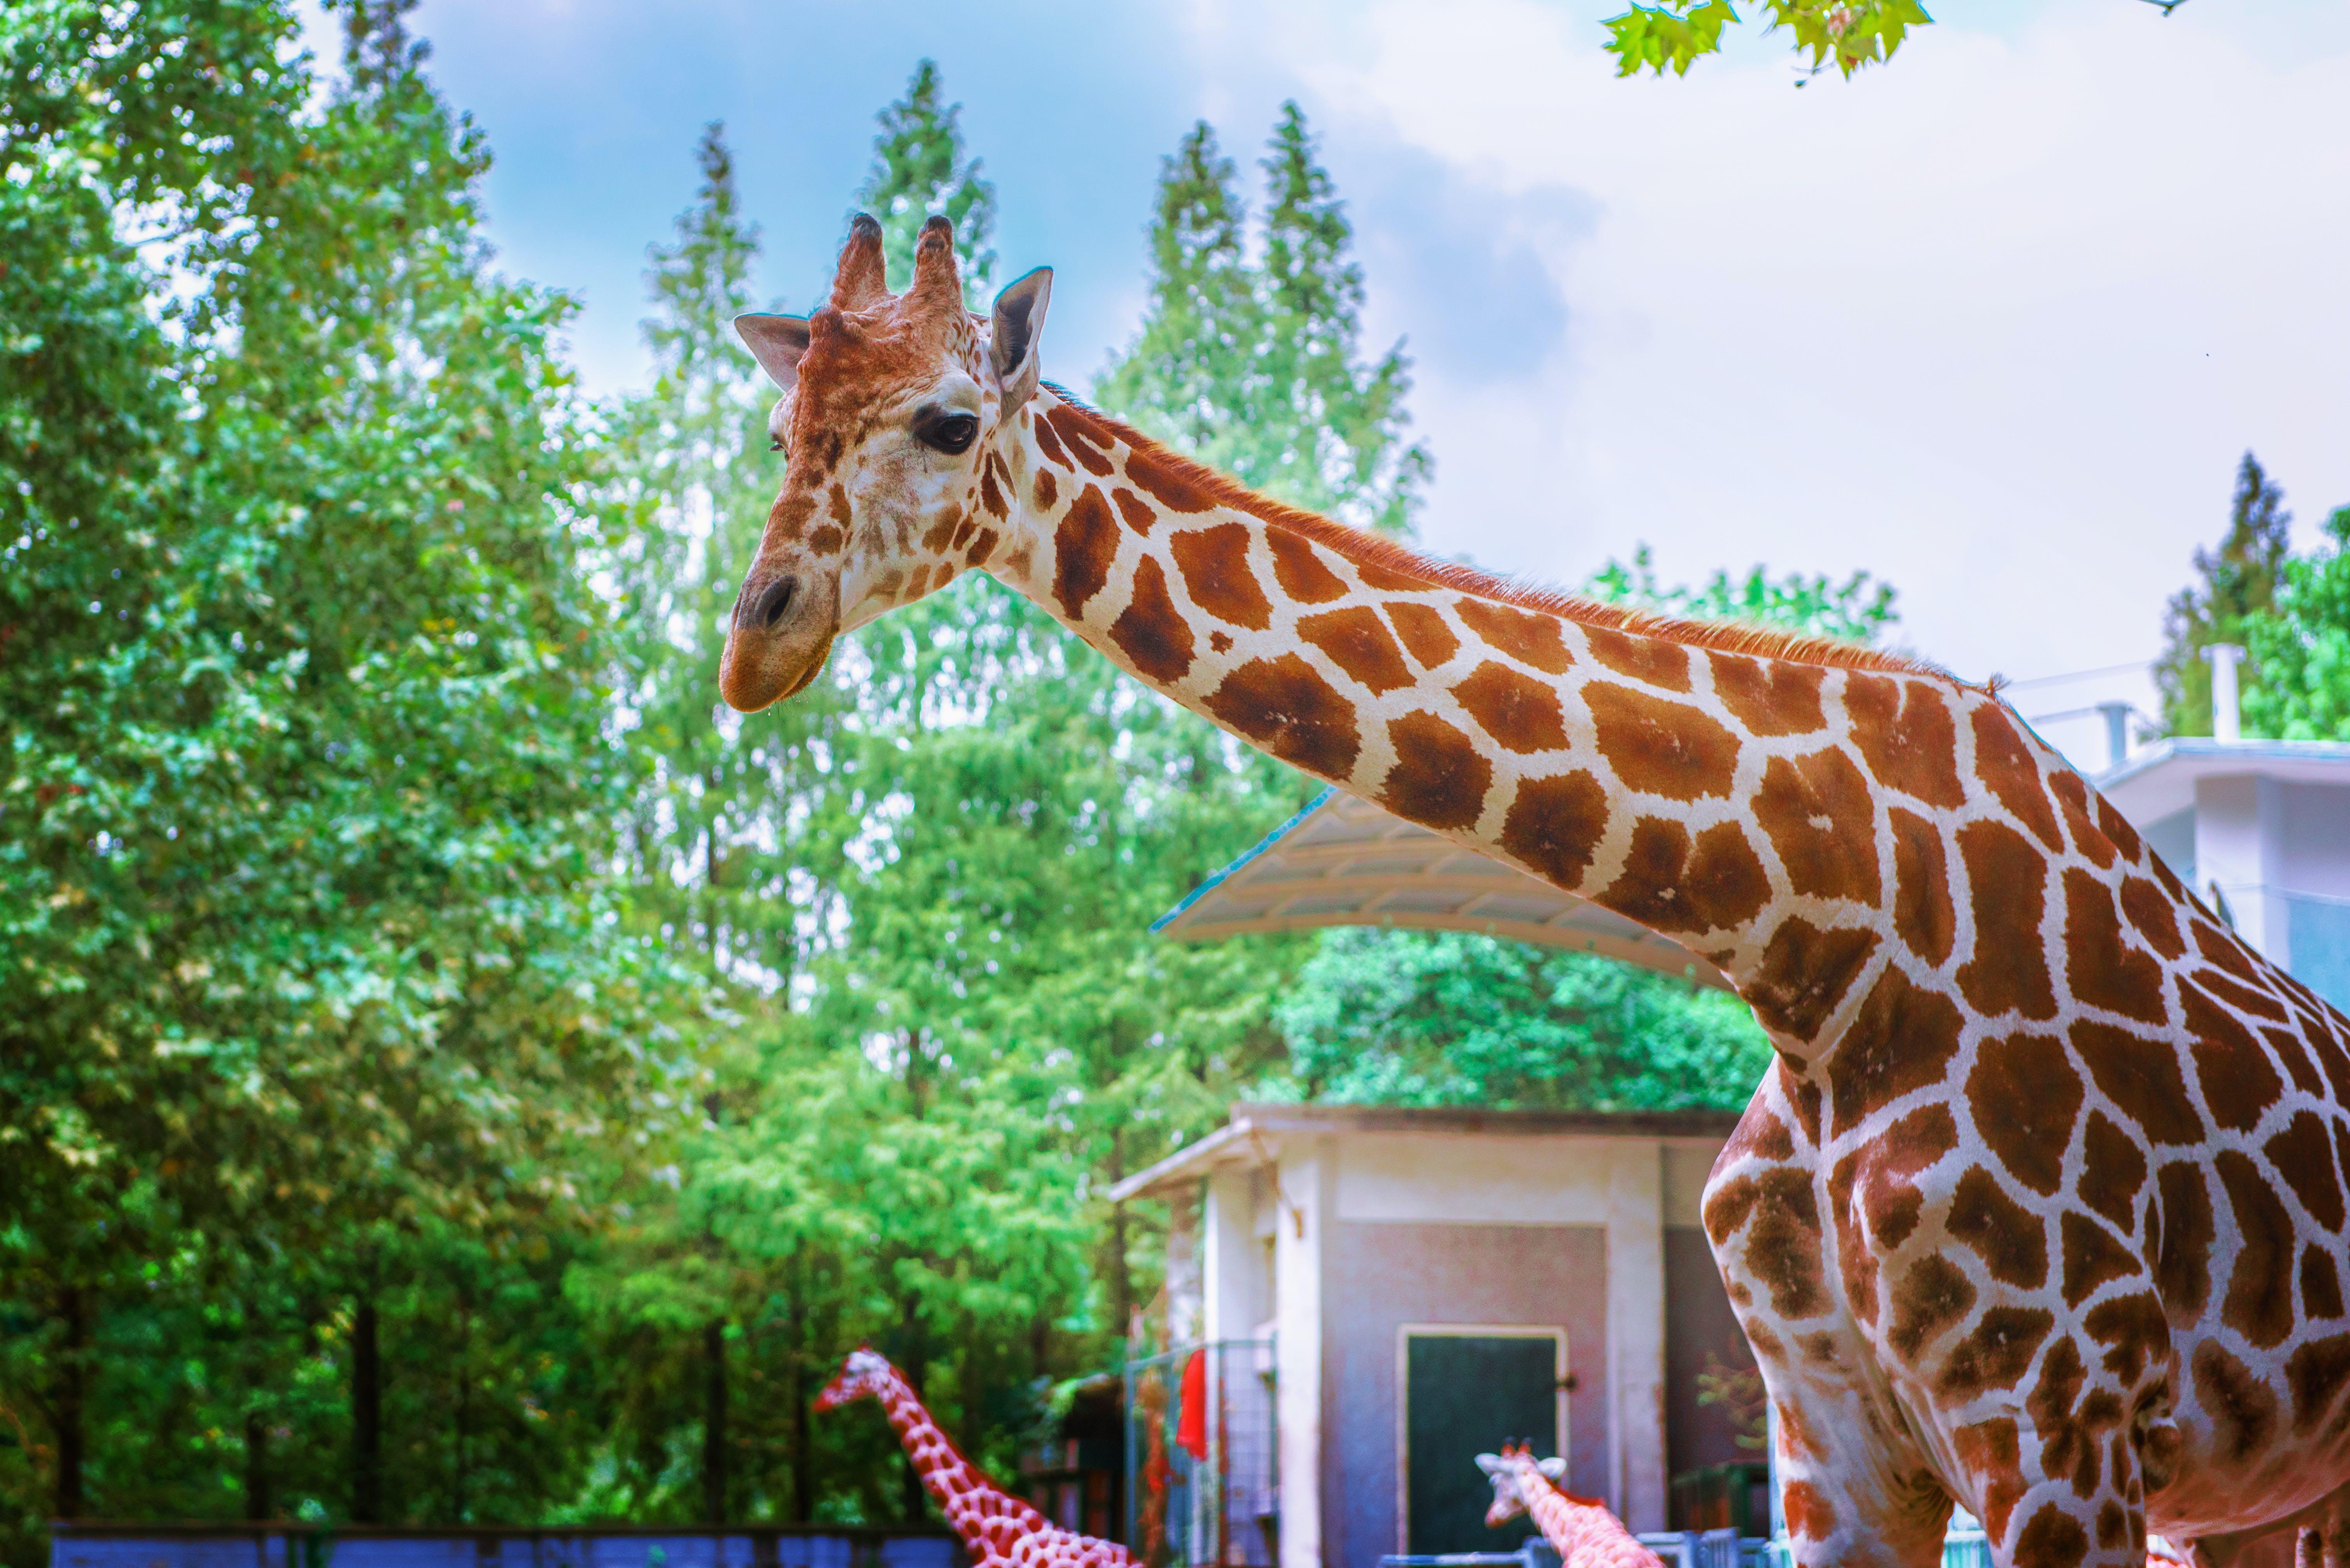 Giraffe Standing Under Trees